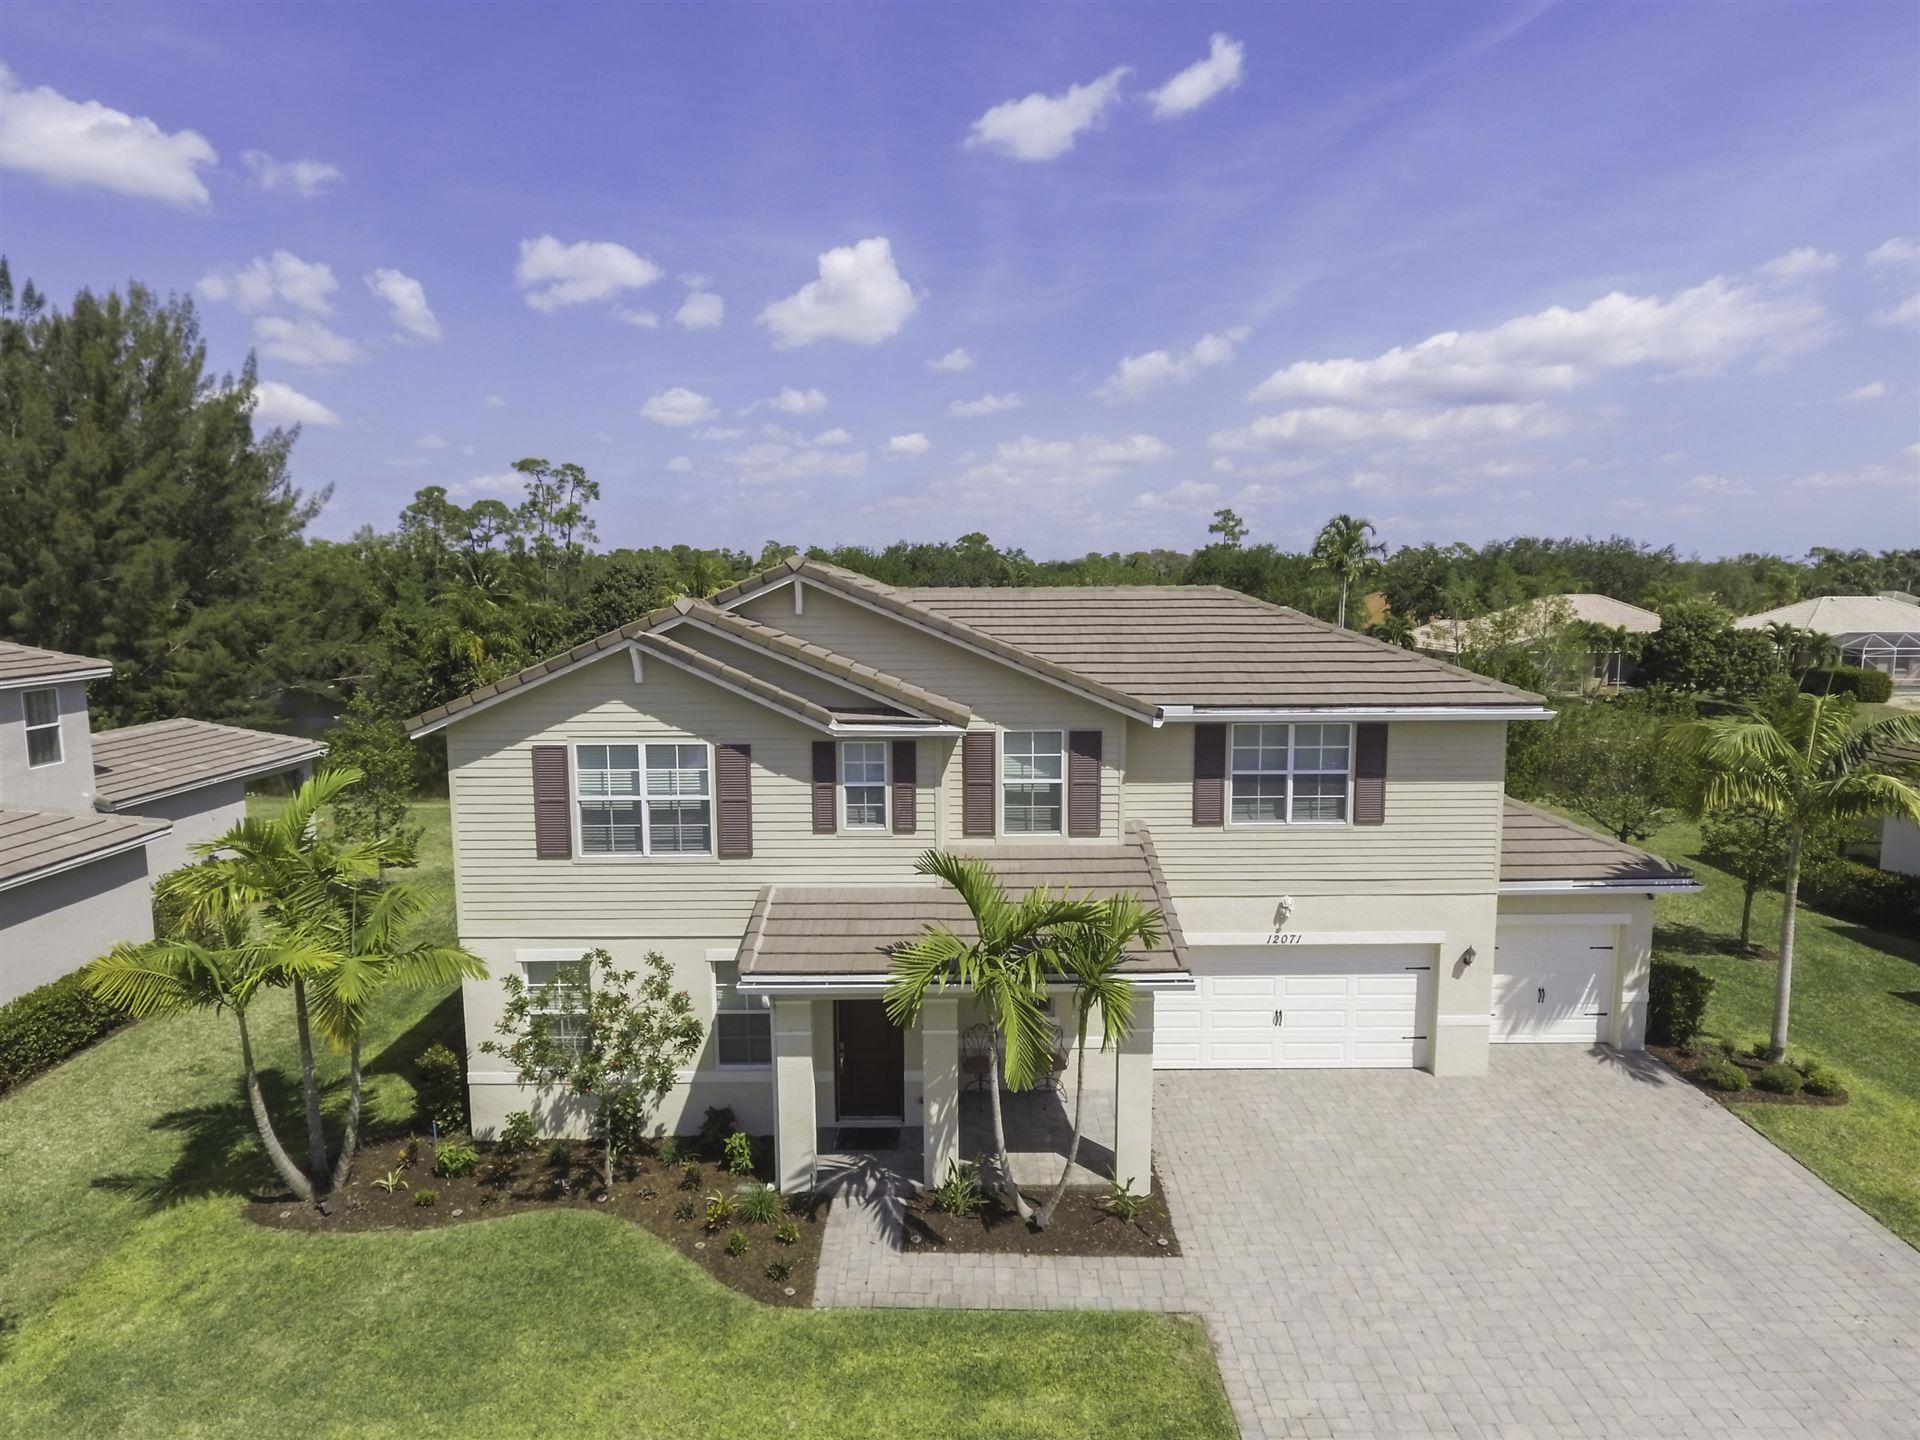 12071 Cypress Key Way, Royal Palm Beach, FL 33411 - #: RX-10703133